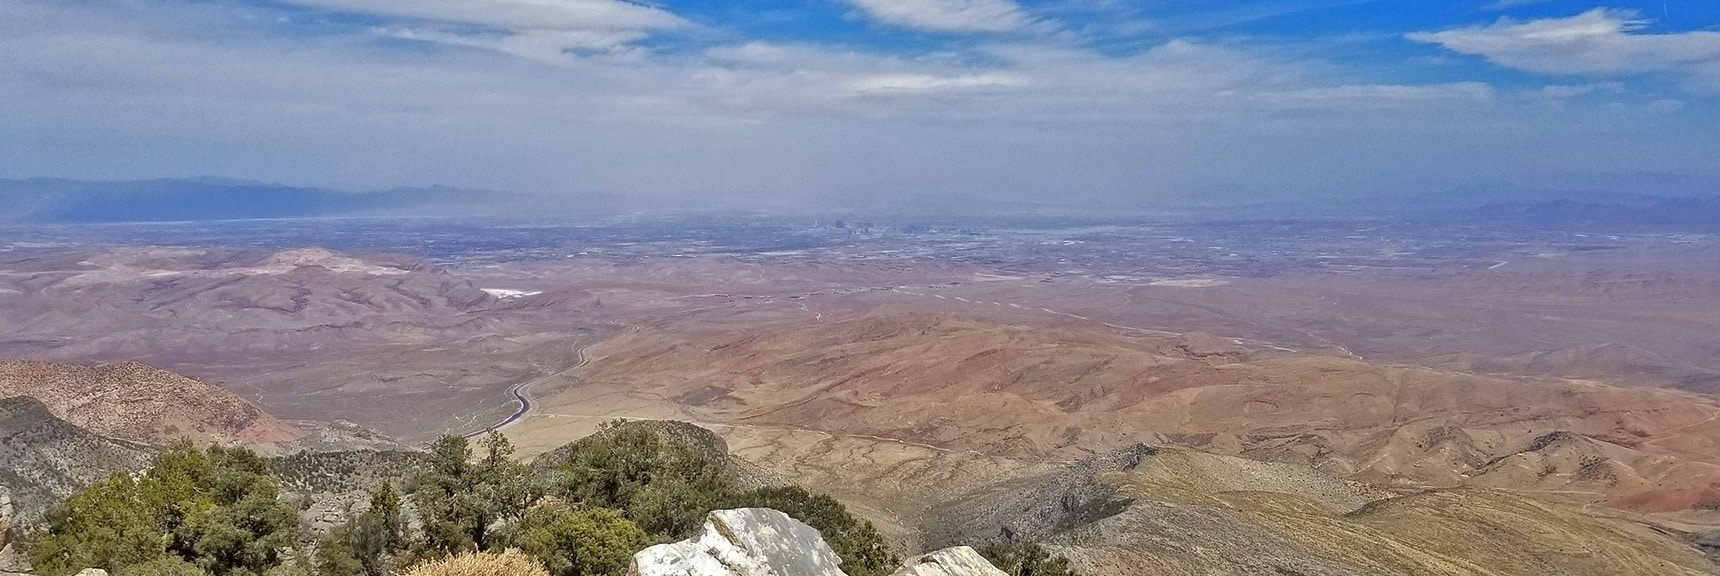 View Toward Las Vegas Strip and Beyond in the Haze on This Windy, Dusty Day. | Potosi Mountain Spring Mountains Nevada